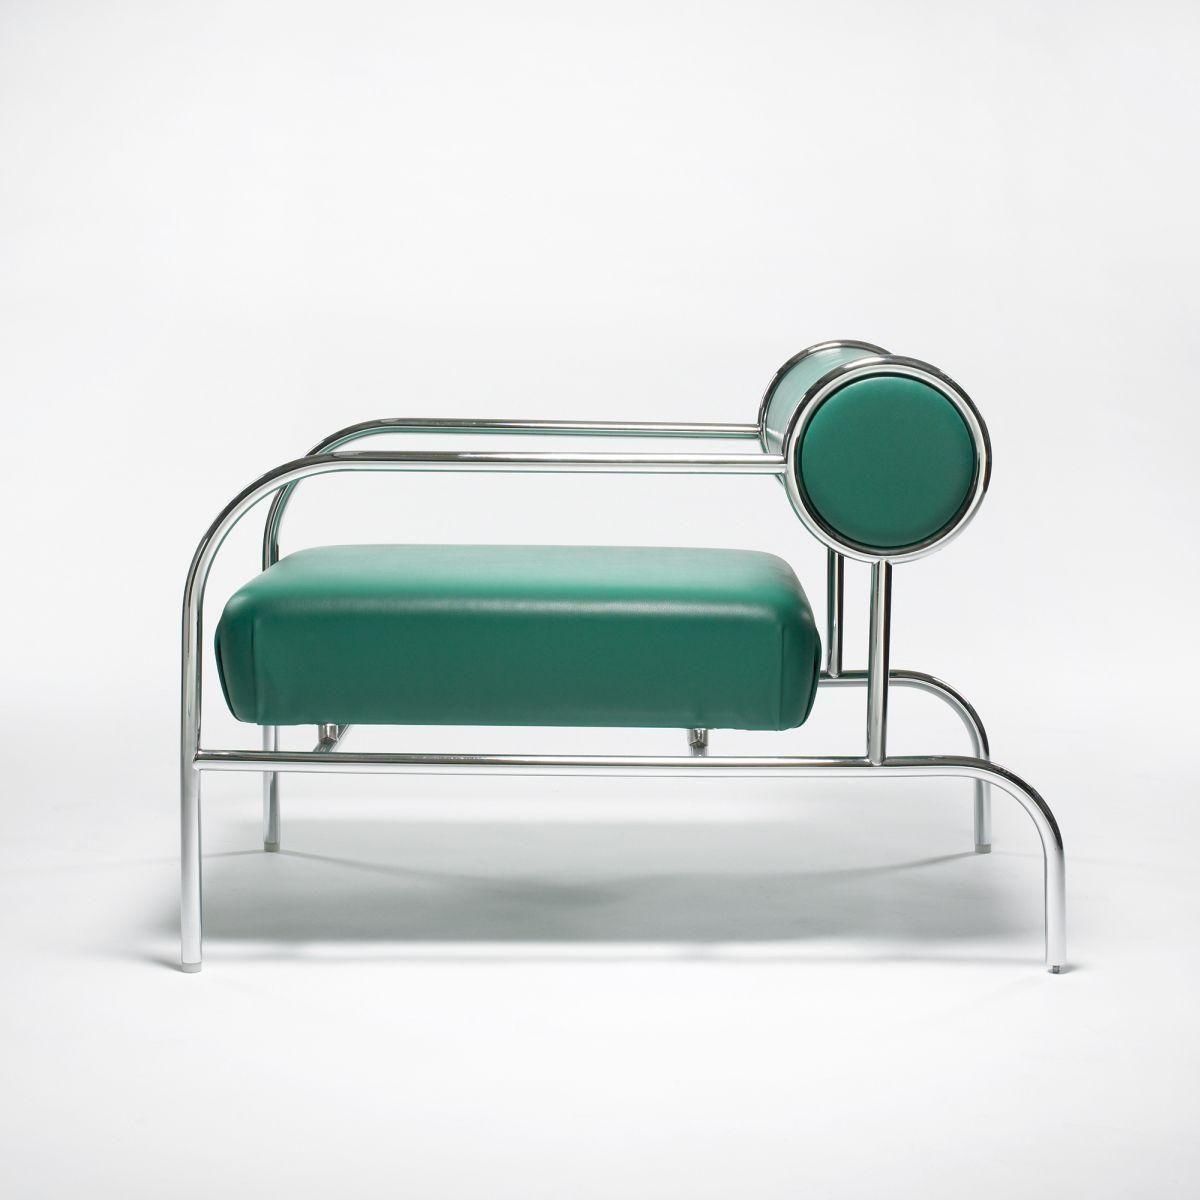 japon design ann es 80 kuramata si ge mobilier furniture mobilier fauteuil et mobilier. Black Bedroom Furniture Sets. Home Design Ideas